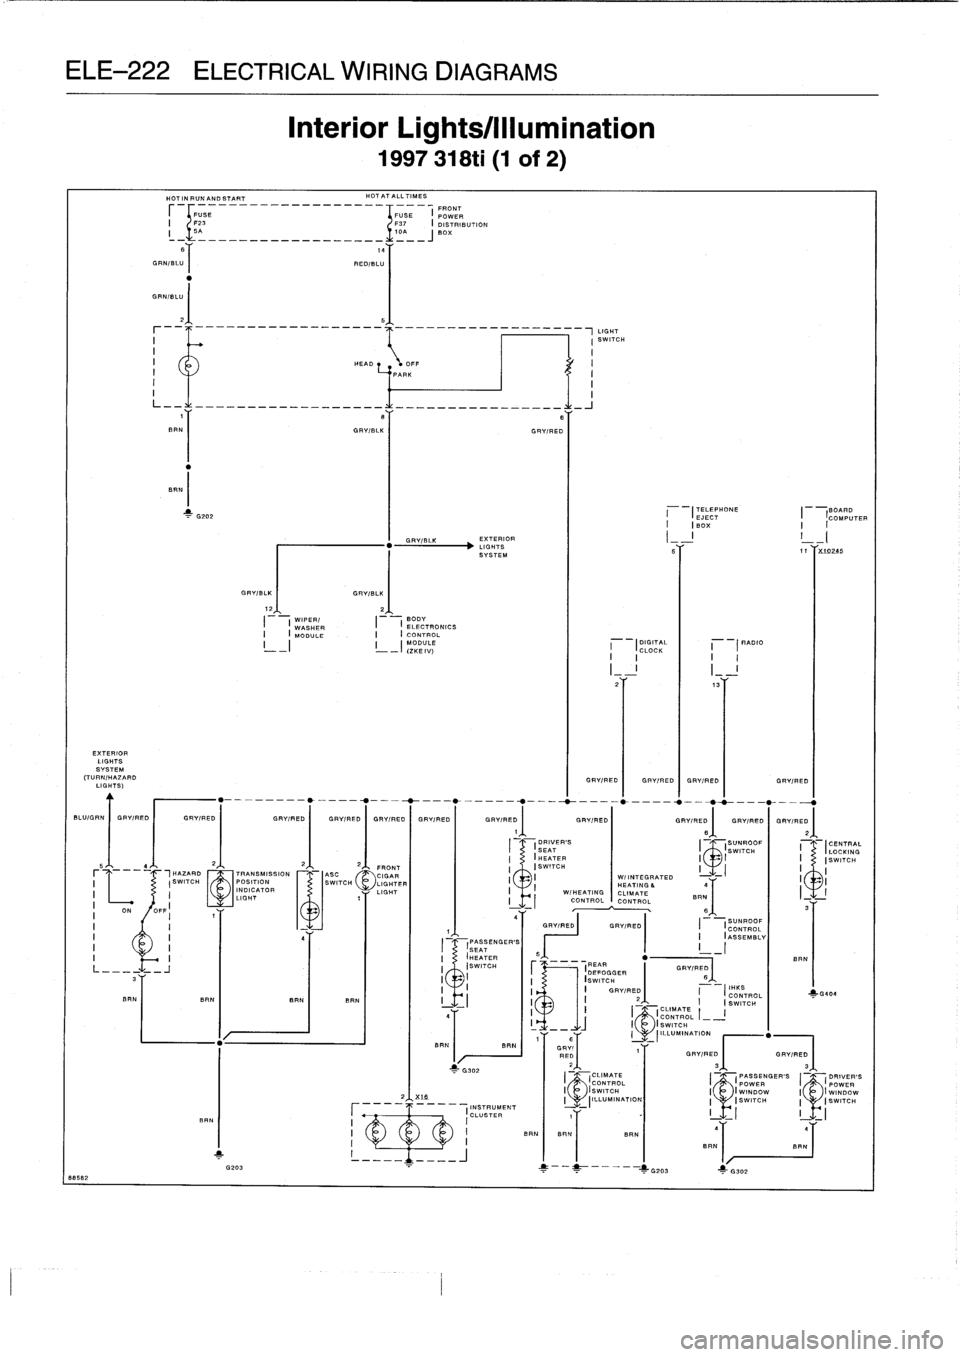 Bmw 328i 1995 E36 Workshop Manual Wiring Diagram Power Windows